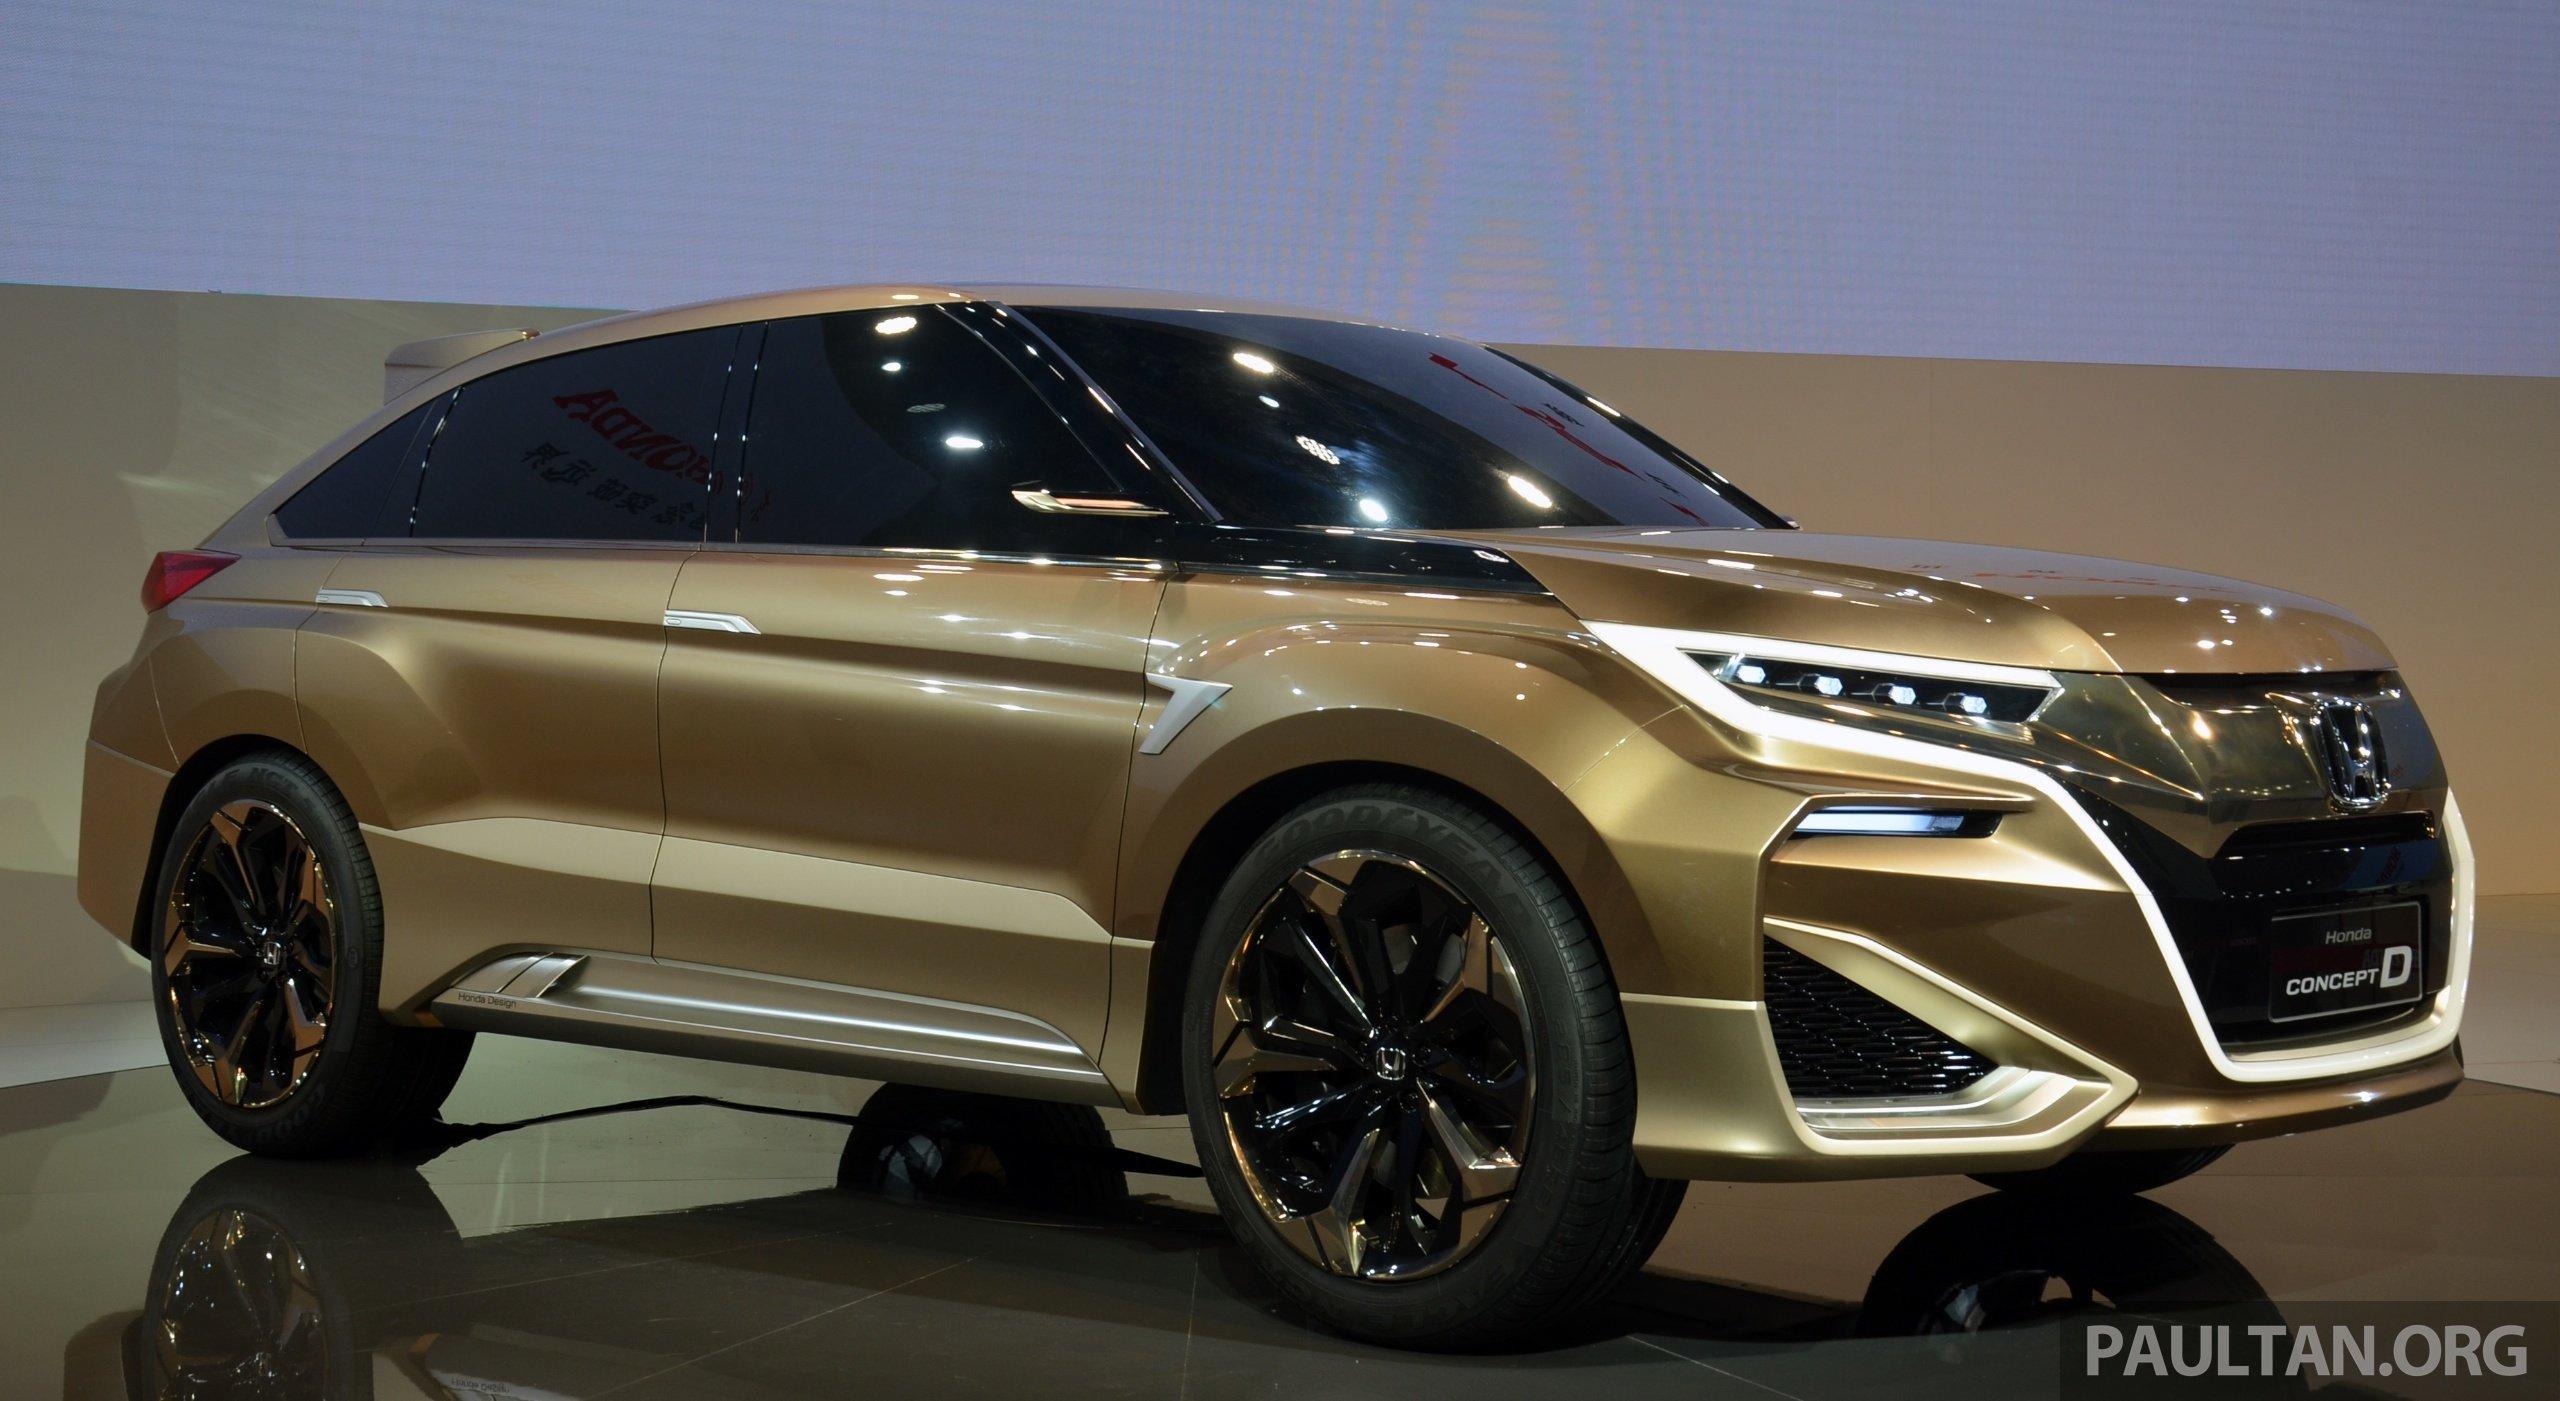 Shanghai 2015 Honda Concept D Previews New Suv Image 330310